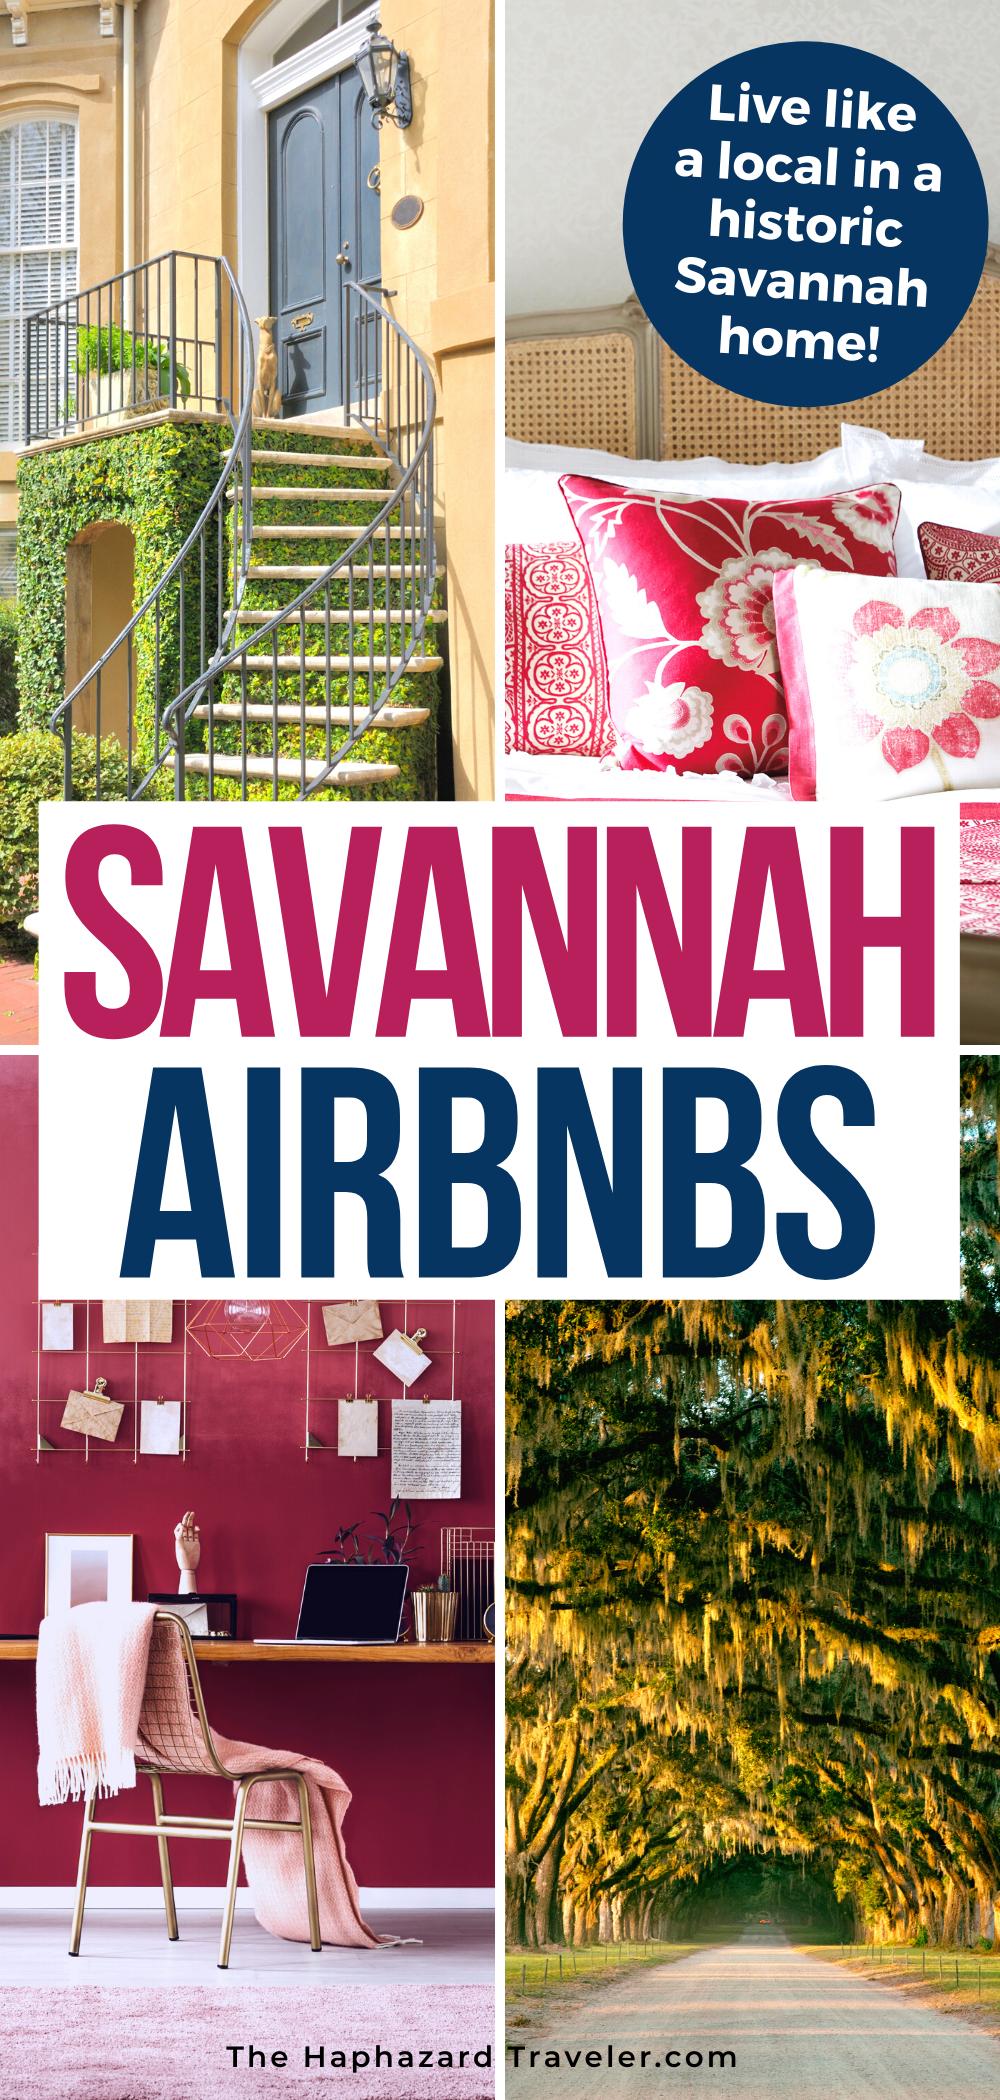 Airbnb Savannah Georgia Historic Stays Neighborhood Tips Savannah Chat Vacations In The Us Travel Savannah